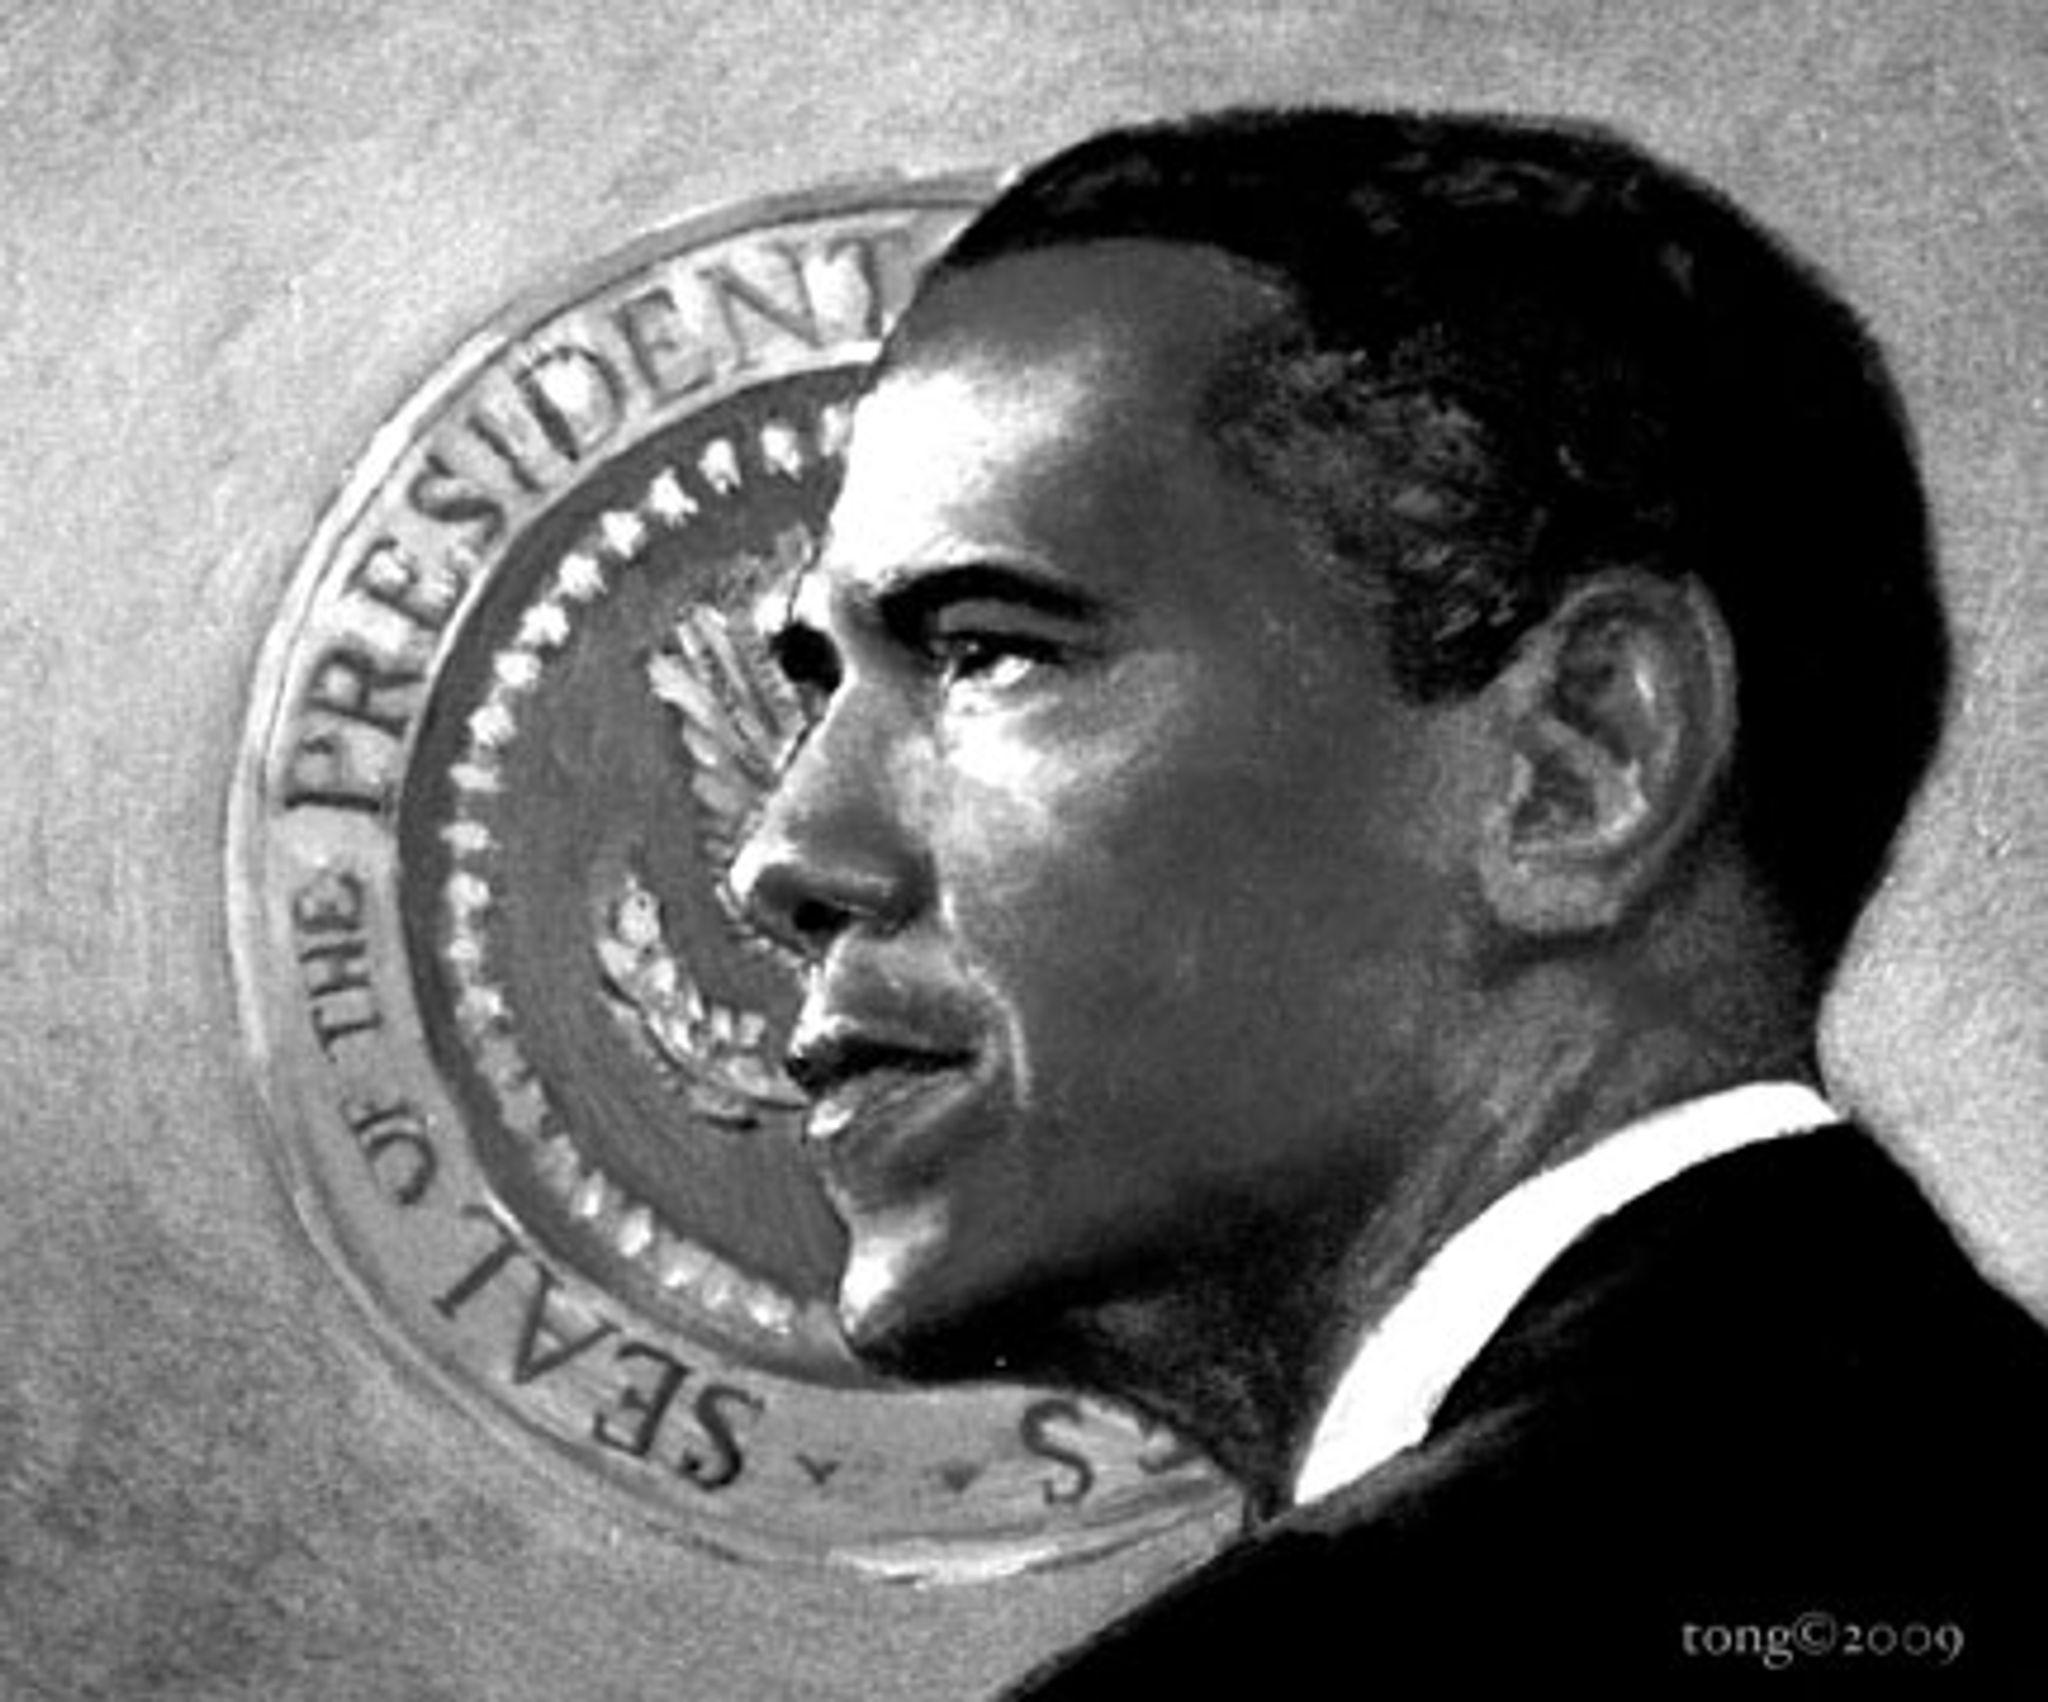 Obama administration was corrupt